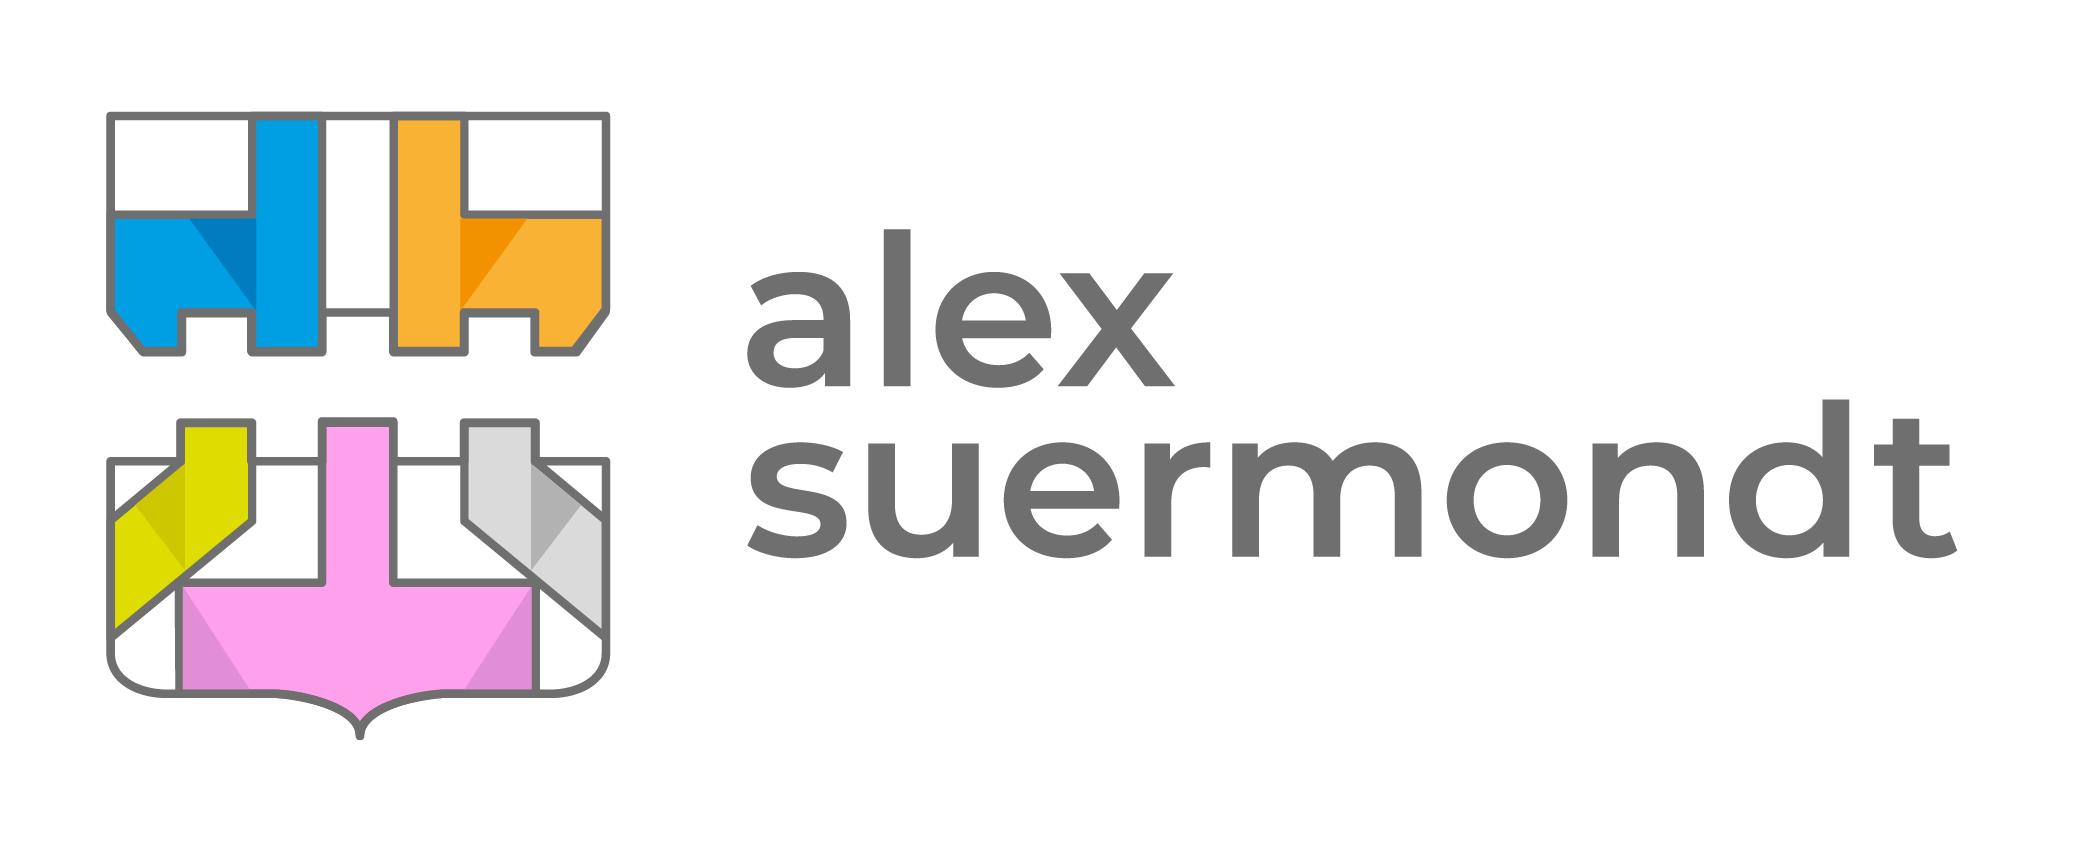 Alex Suermondt